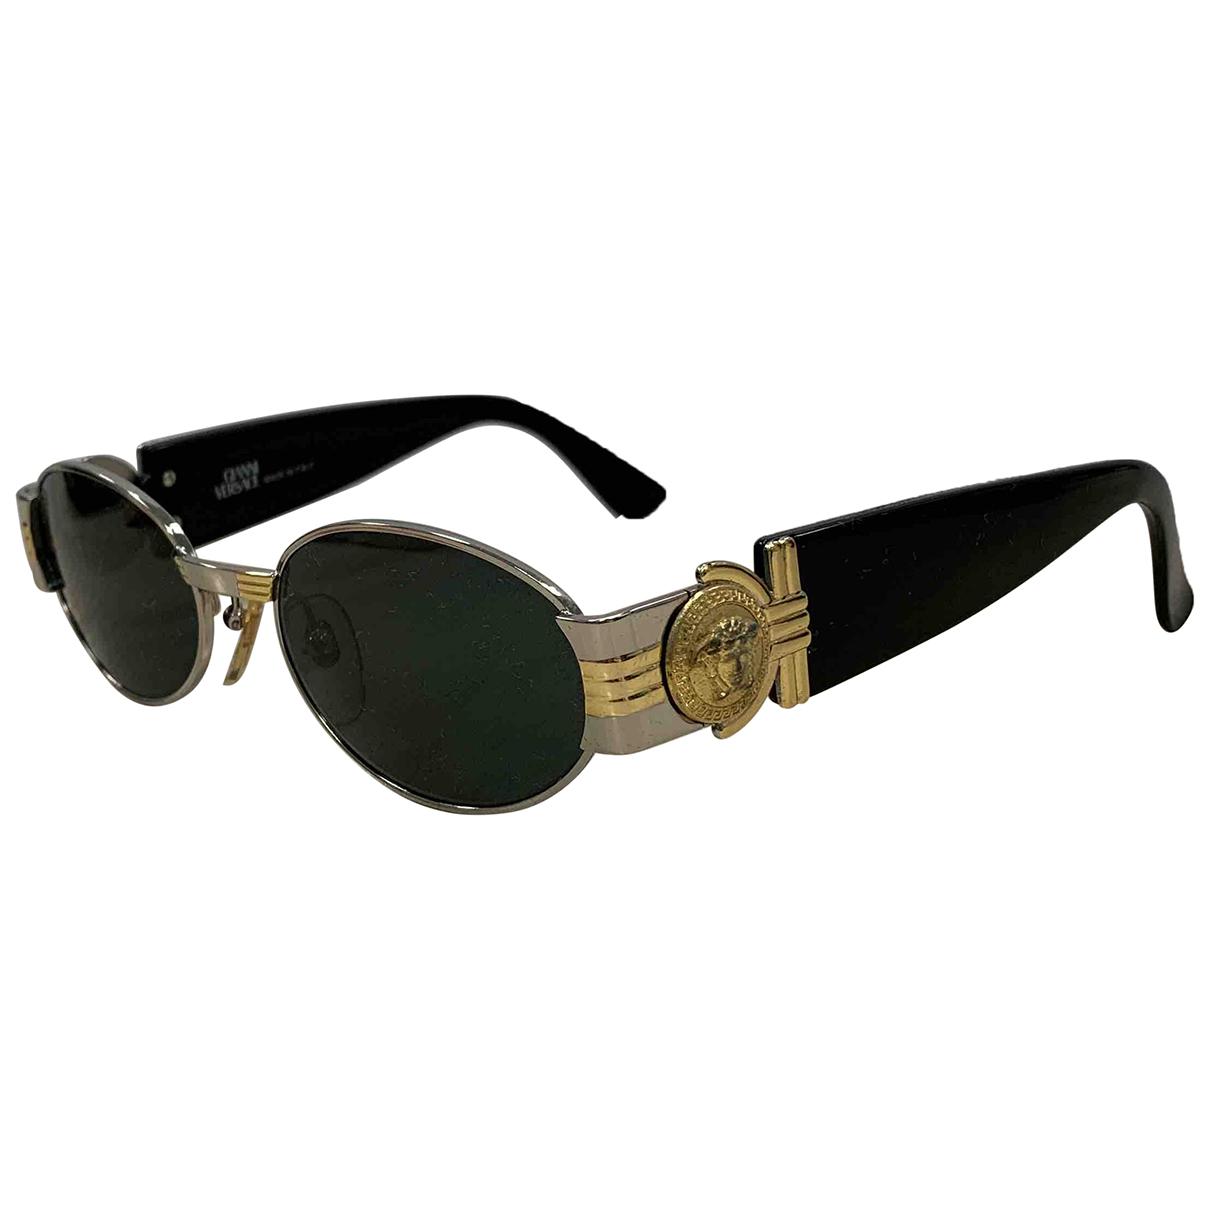 Versace N Multicolour Metal Sunglasses for Women N